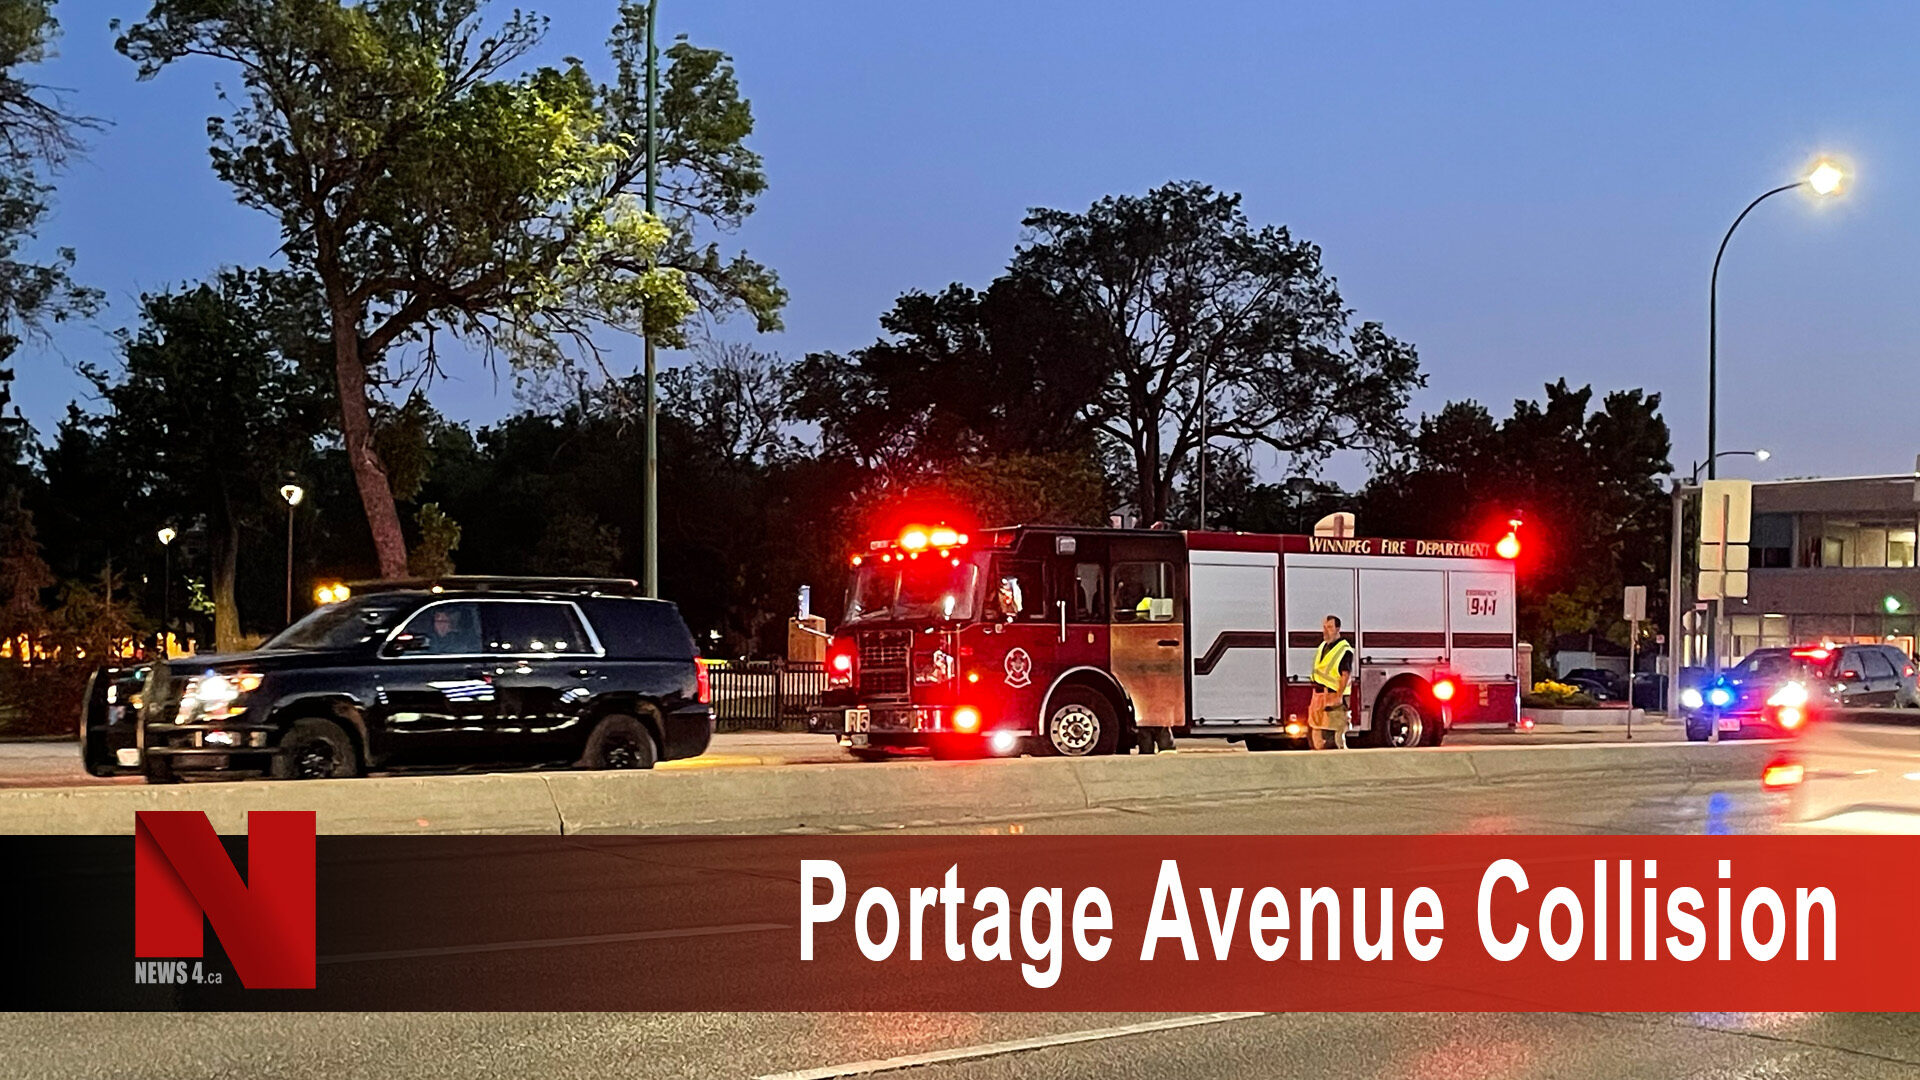 Portage Avenue Collision